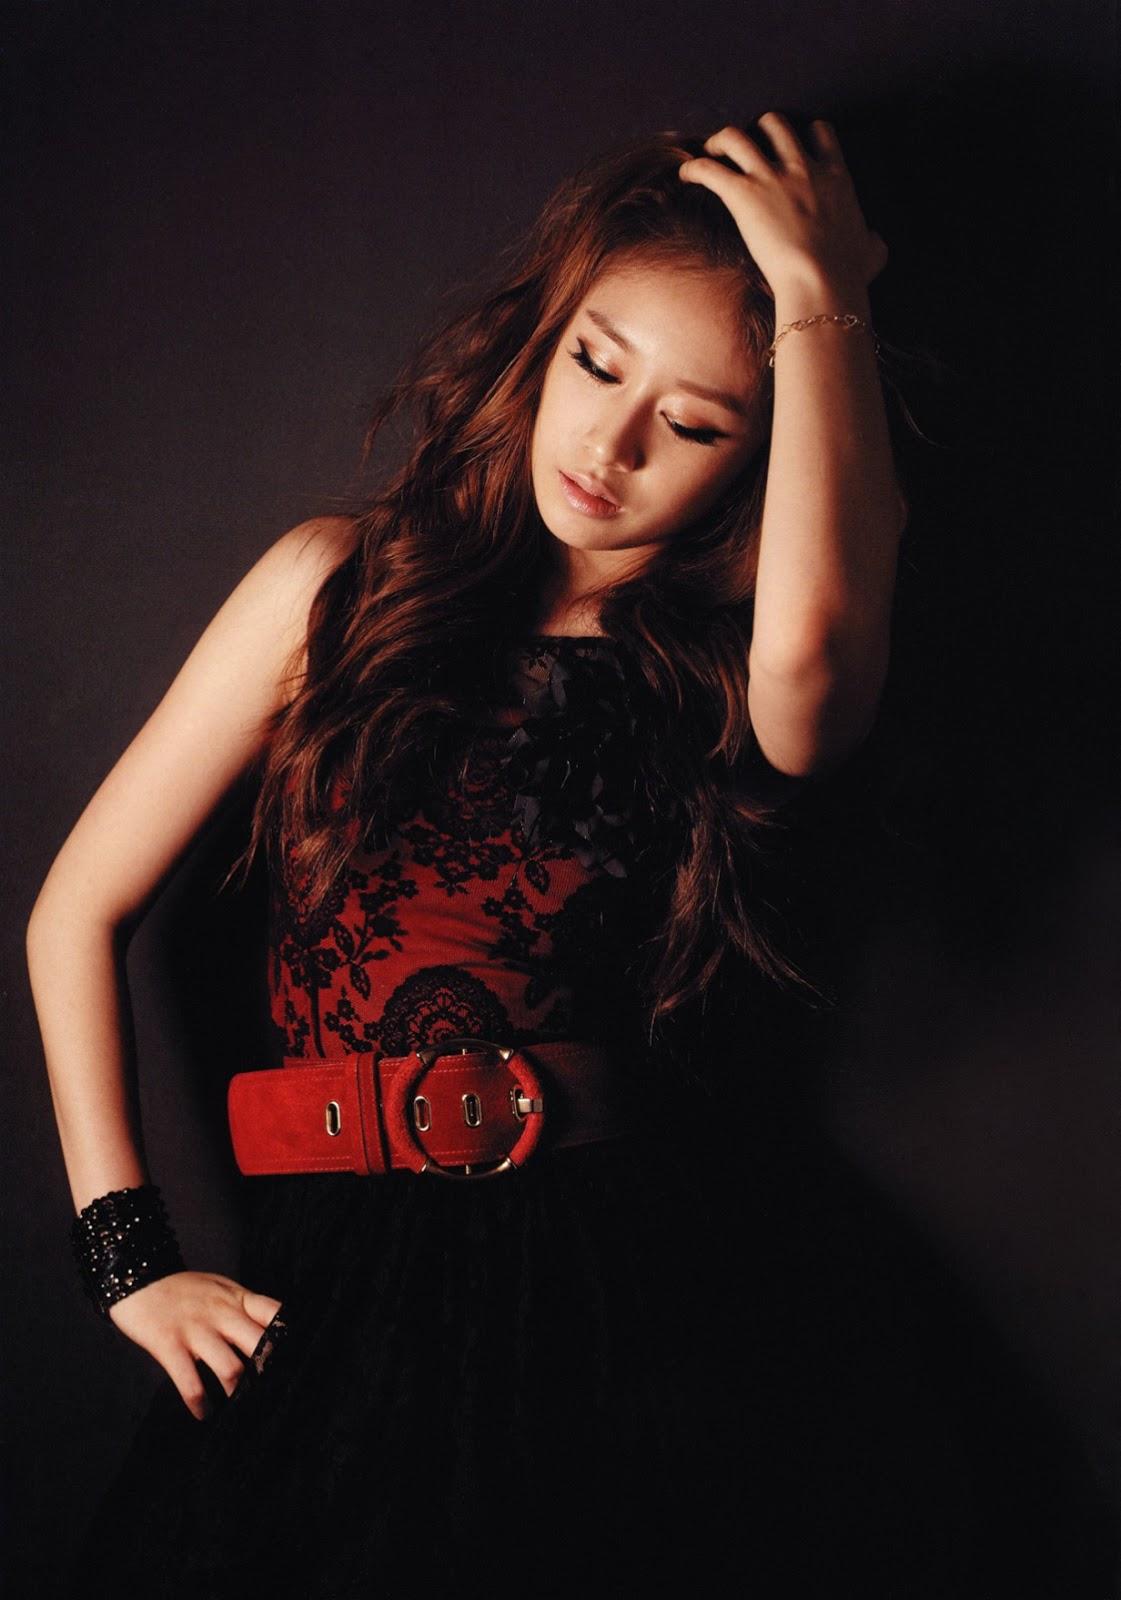 http://4.bp.blogspot.com/-4G_H8X4qEQ8/UOGCw0Whw6I/AAAAAAAAVfo/rTWutc65Tcs/s1600/T-ara+Jiyeon+Sparkle+Psuperobook+pics+HQ+2.jpg